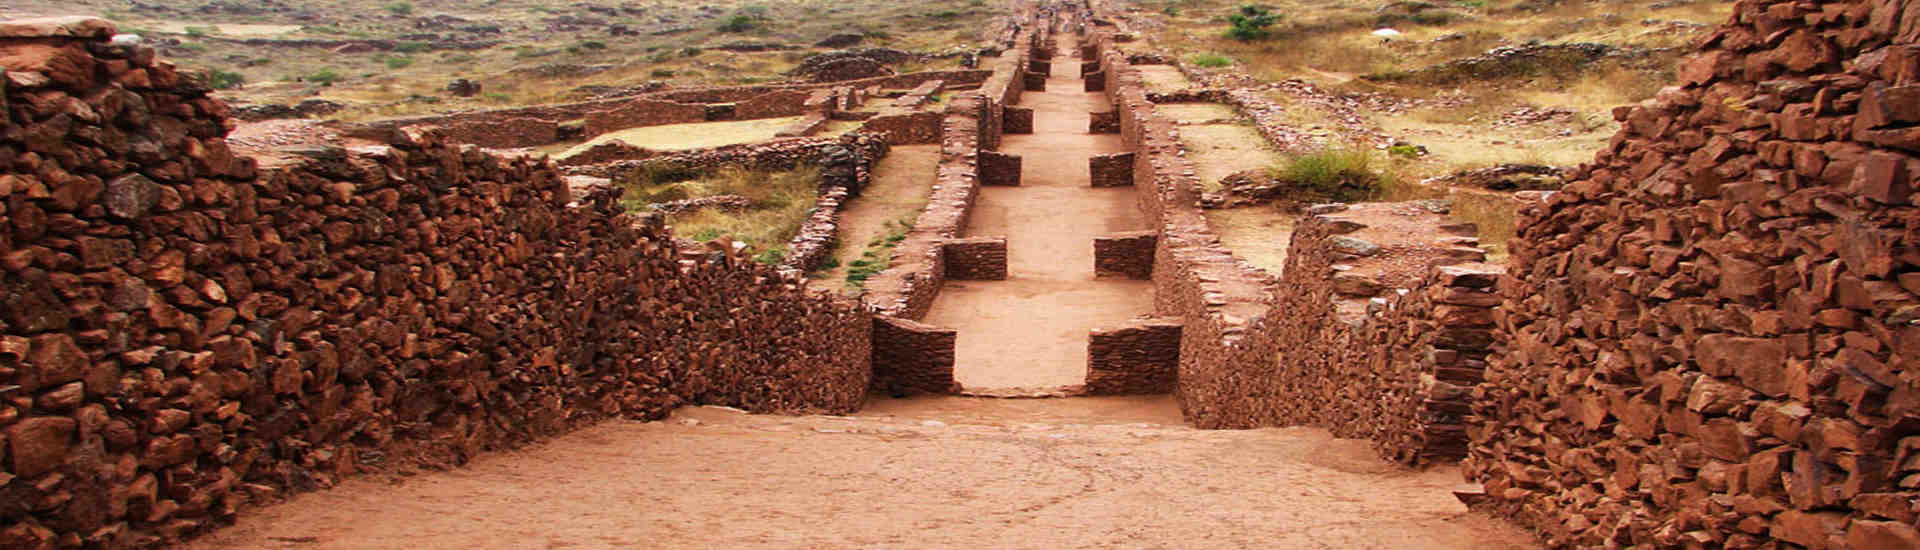 tours valle sur cusco toursperumachupicchu.com